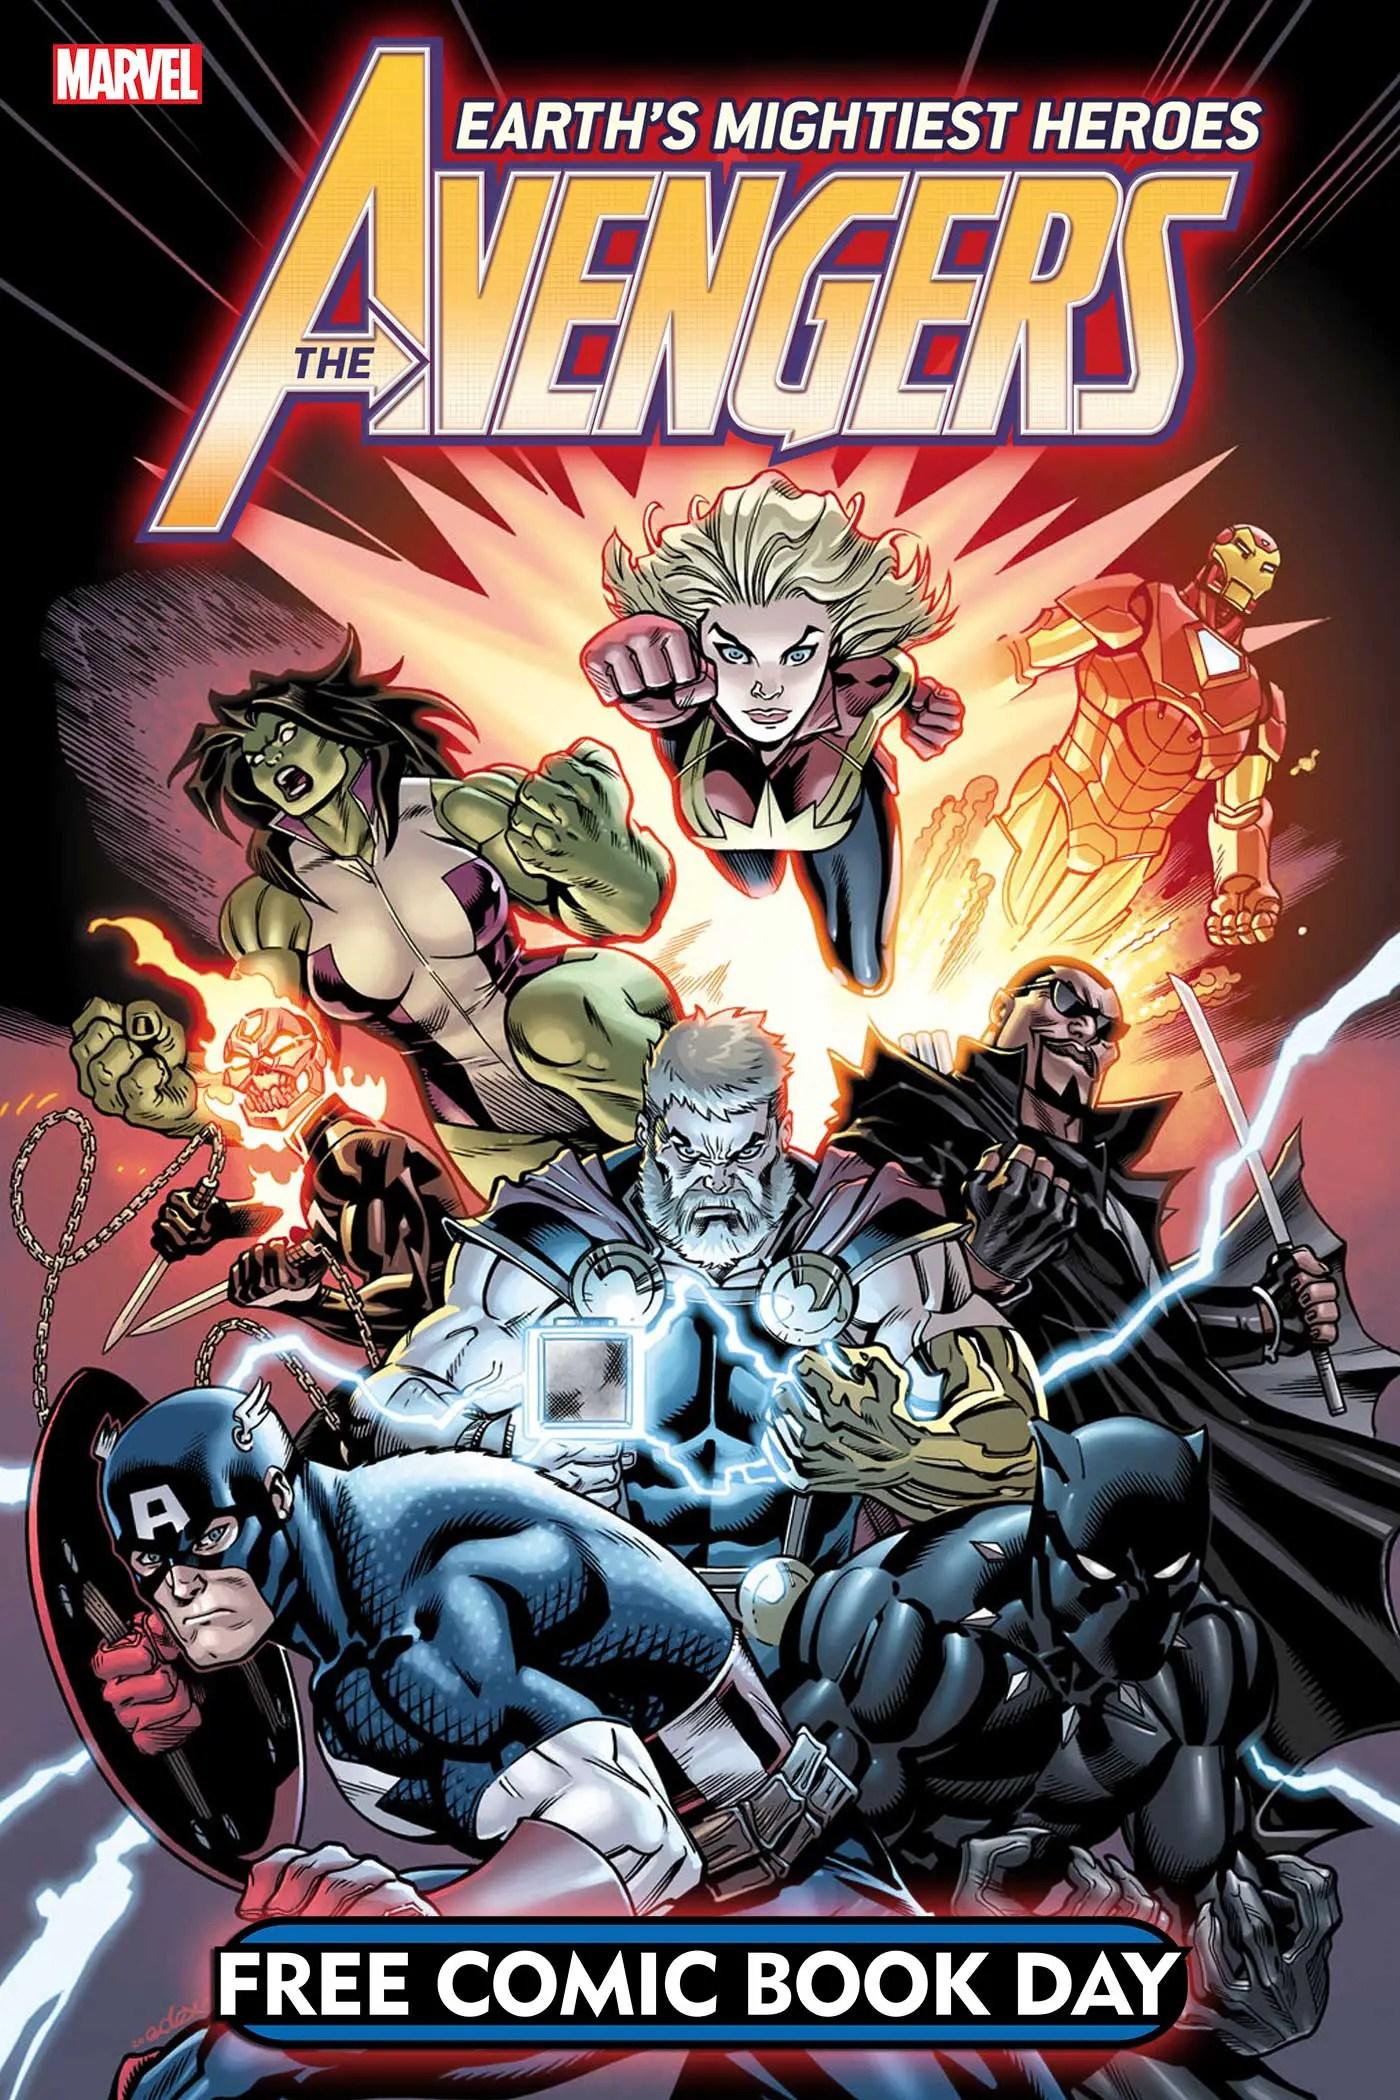 FCBD 2019: Avengers #1 review: Big superhero storytelling